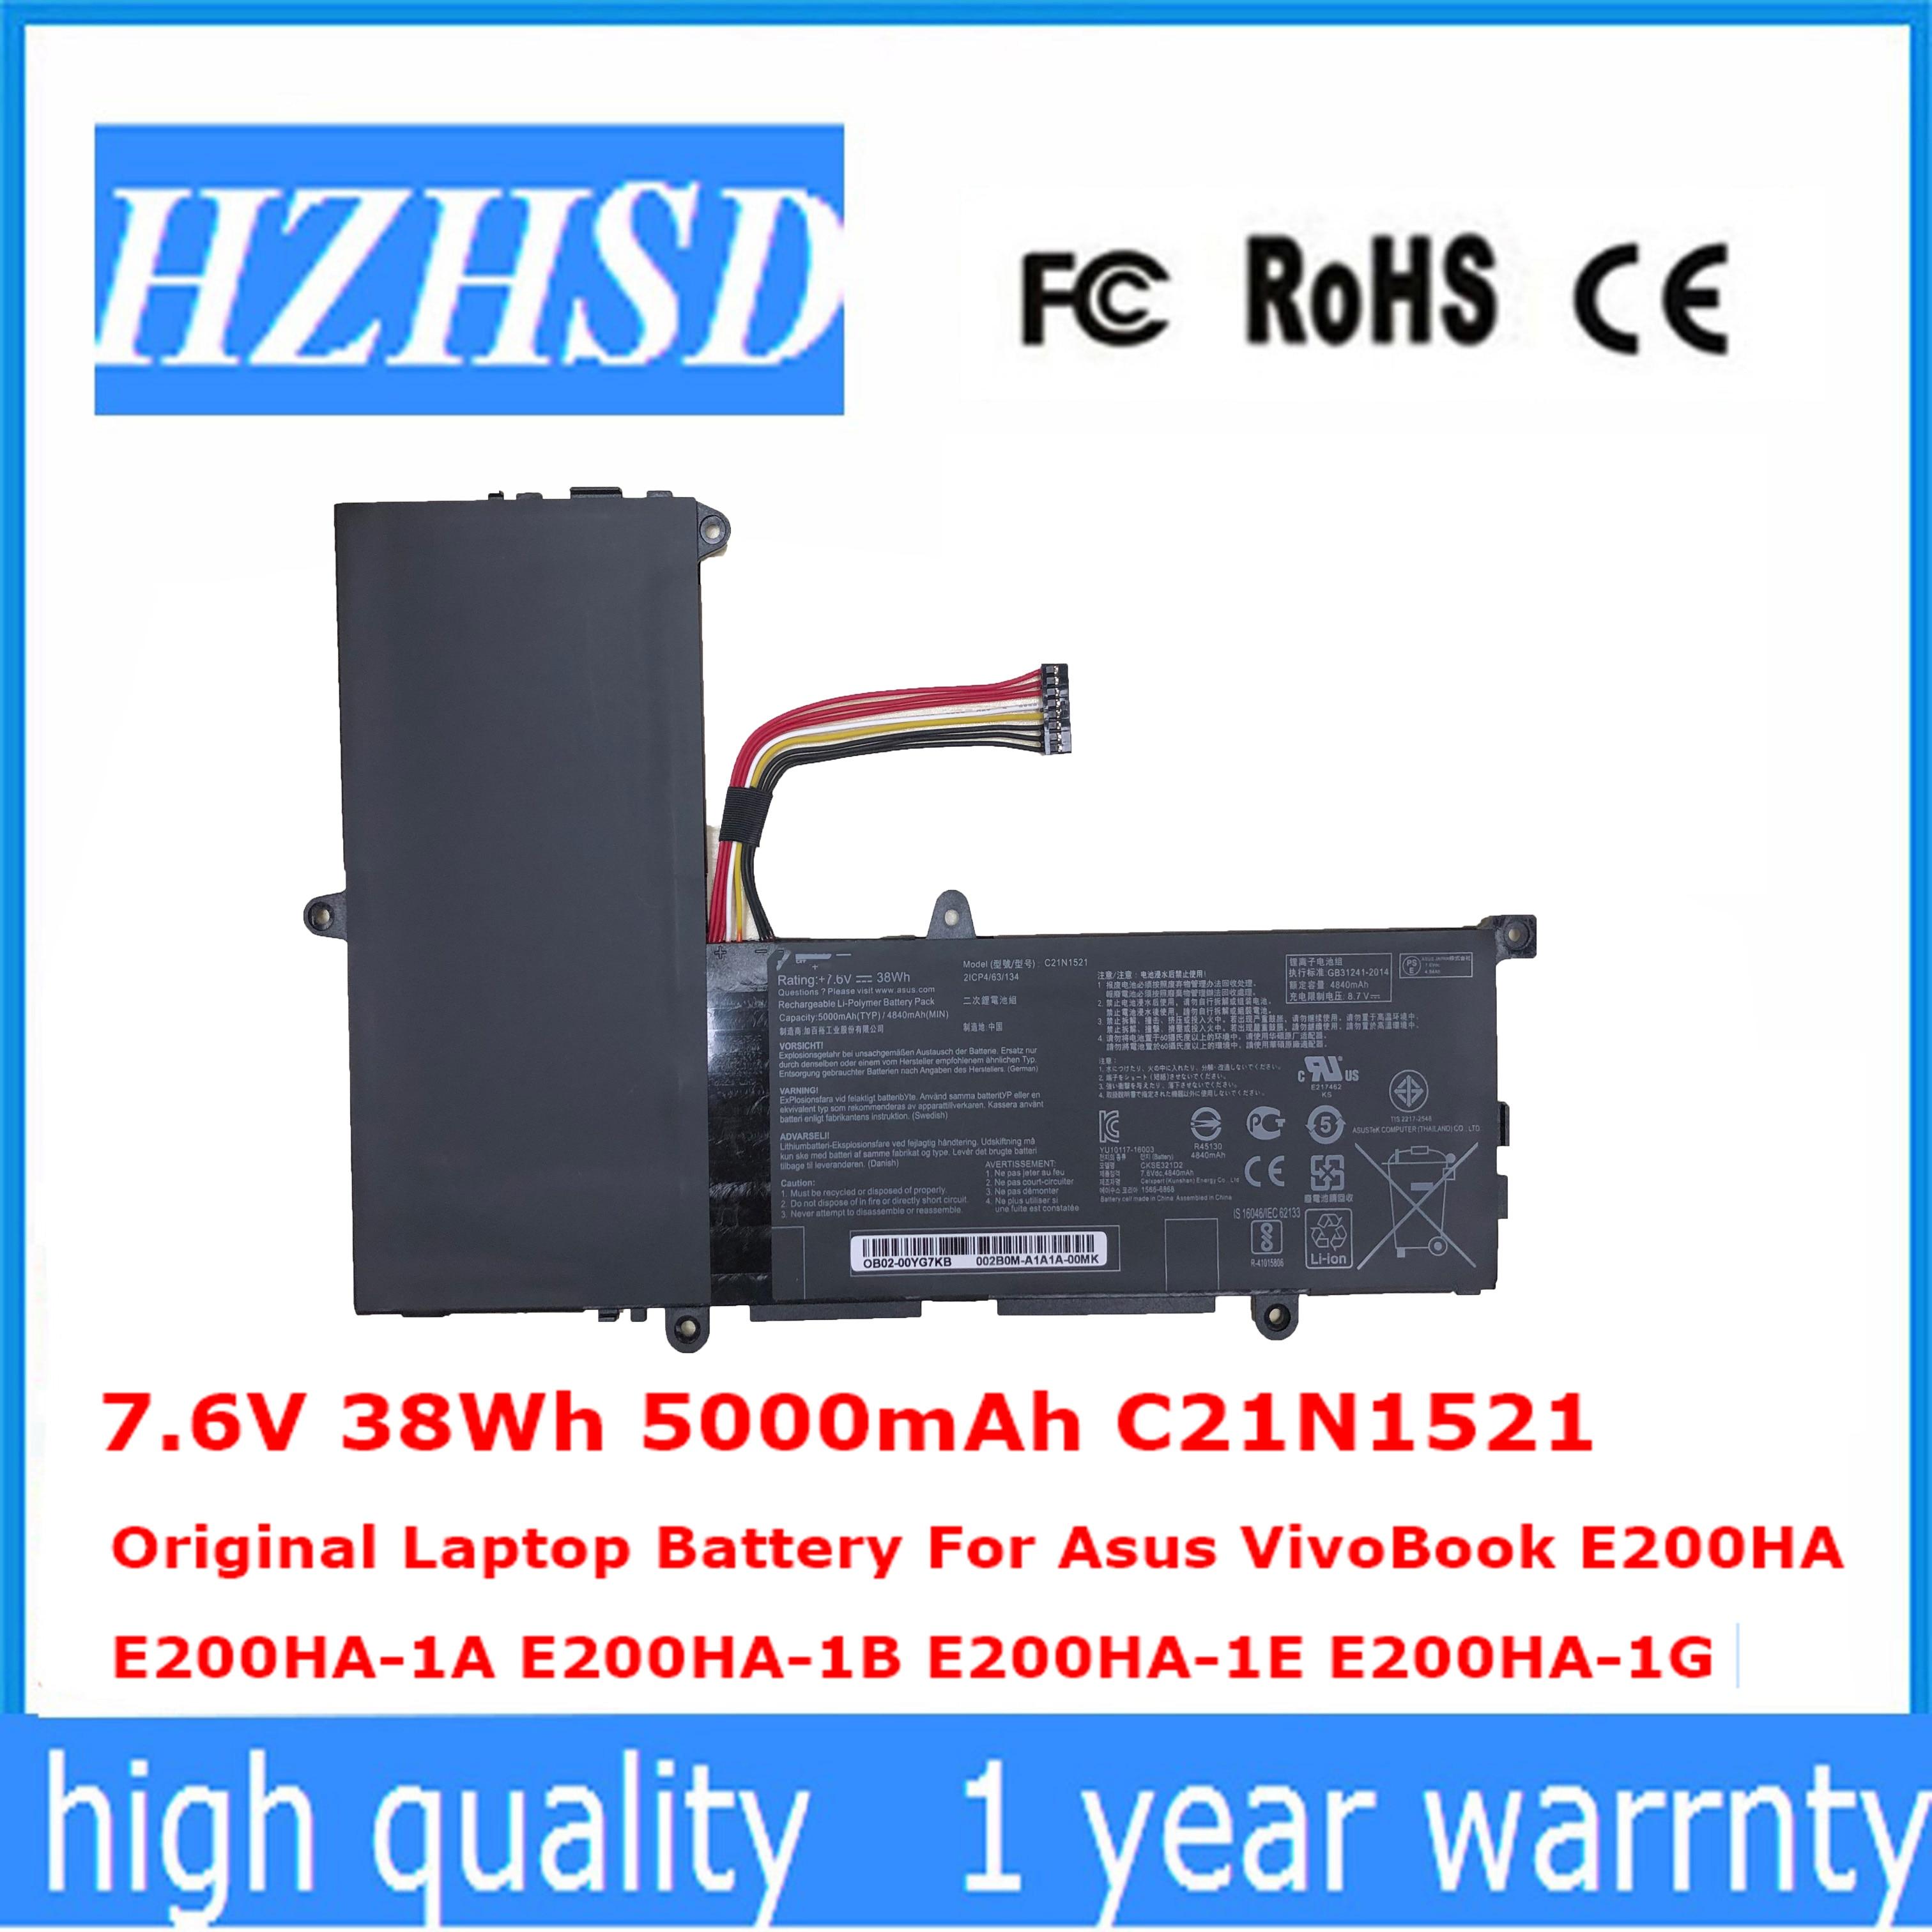 7.6V 38Wh 5000mAh C21N1521 الأصلي بطارية كمبيوتر محمول ل Asus VivoBook E200HA E200HA-1A E200HA-1B E200HA-1E E200HA-1G